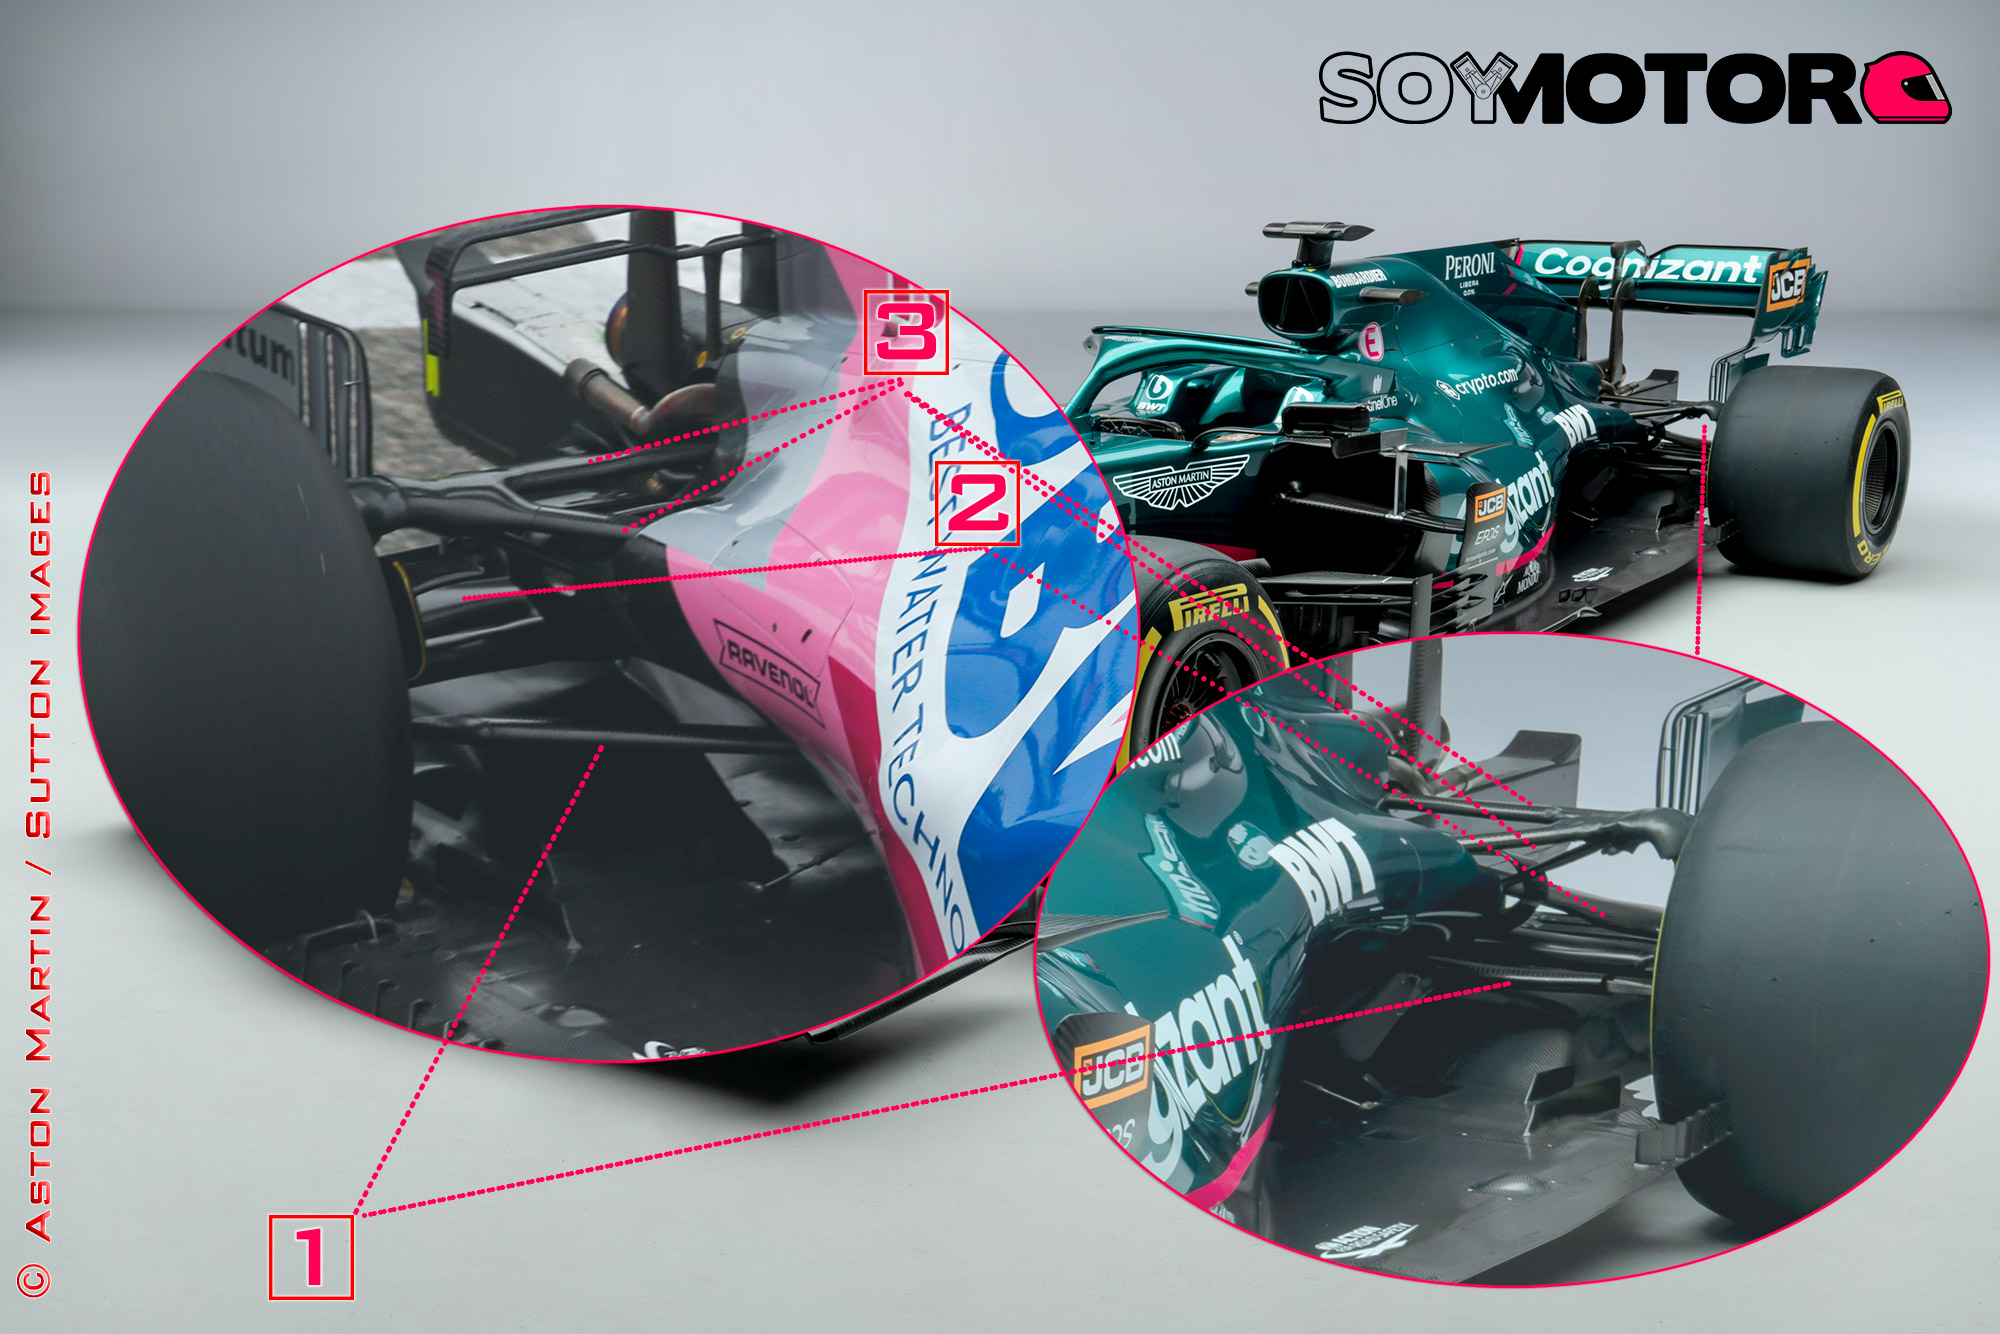 aston-martin-amr21-suspension-trasera-soymotor.jpg